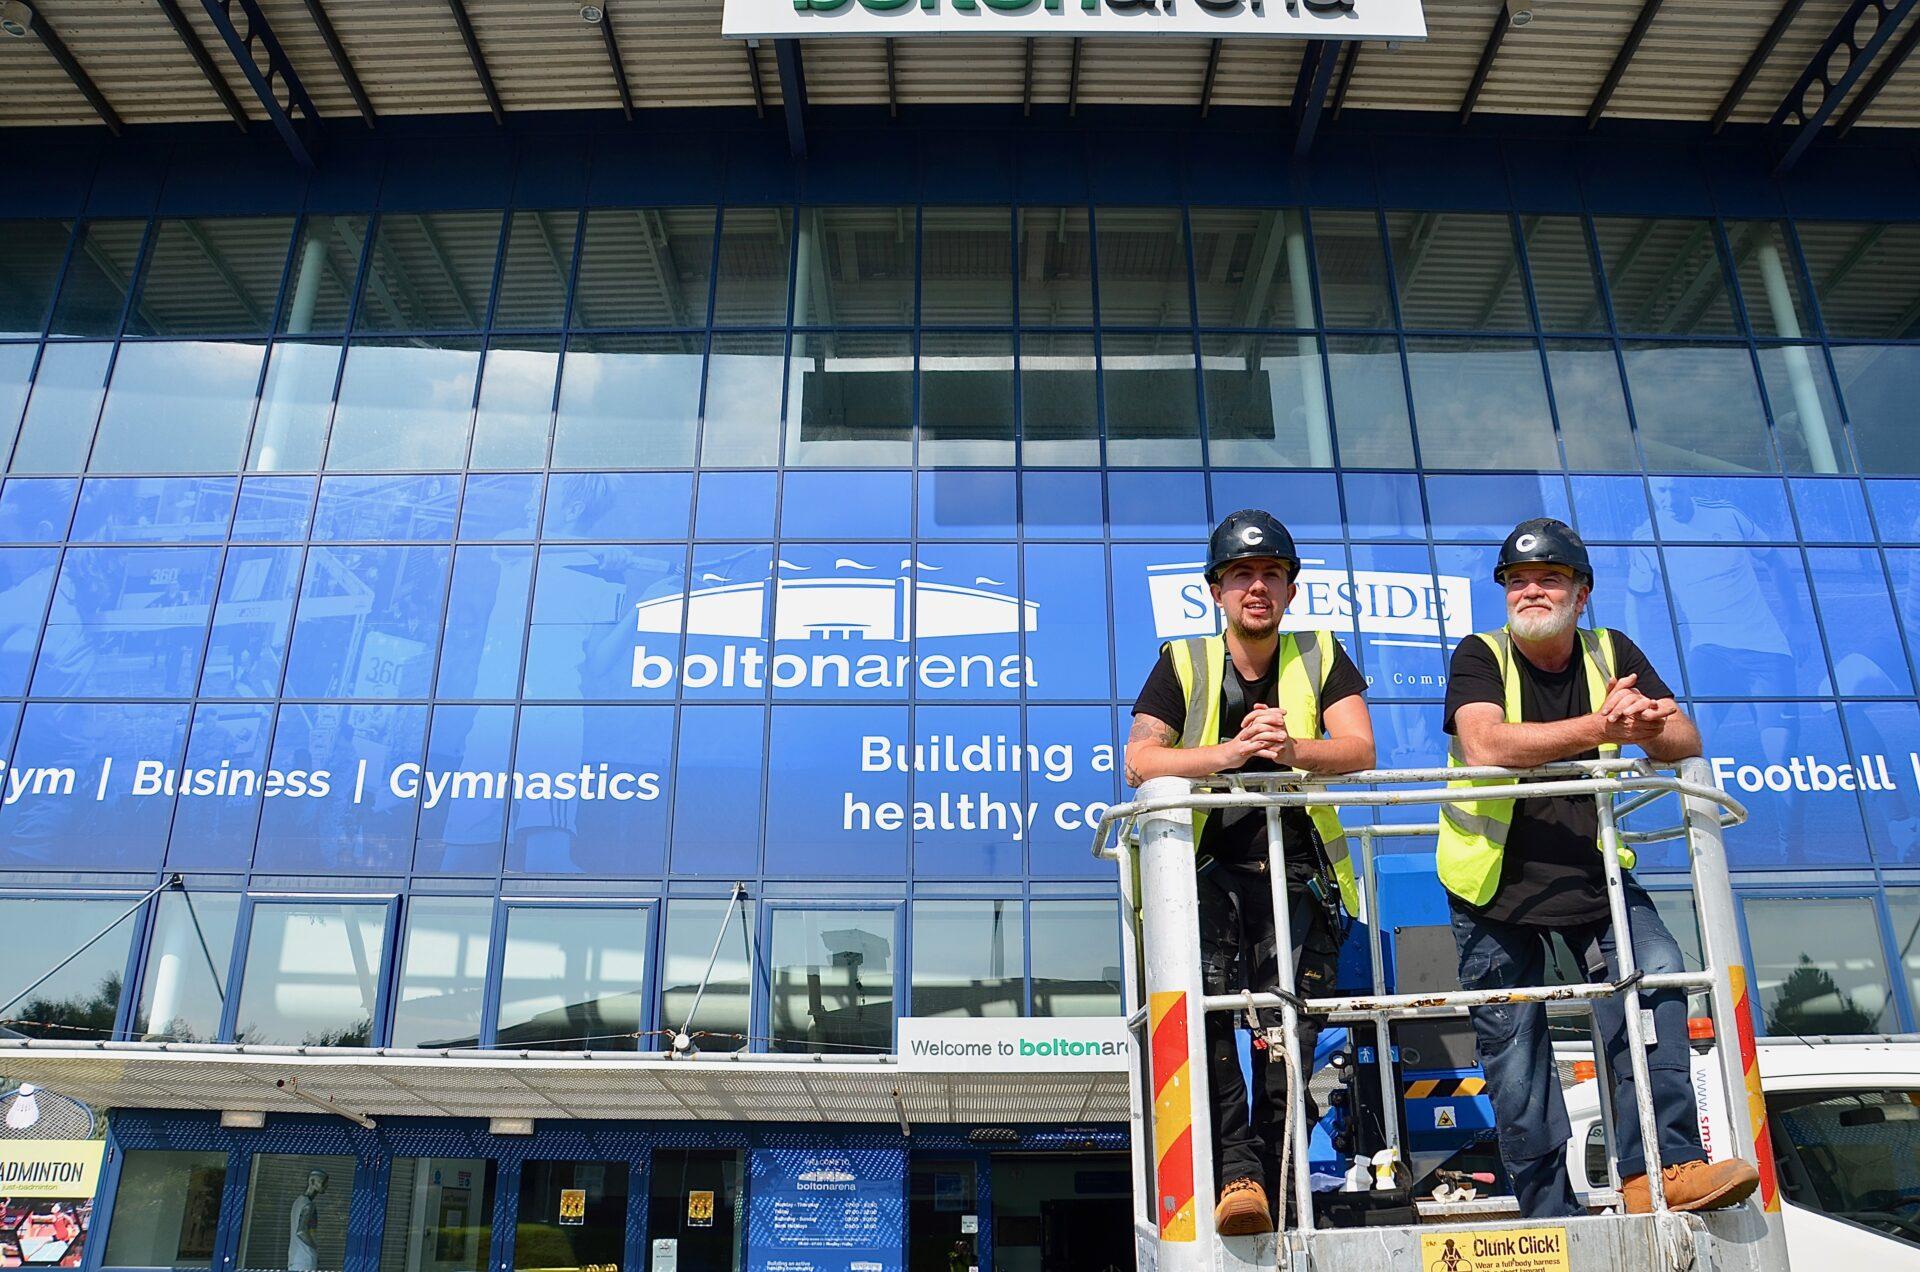 Sam and Steve after Bolton Arena vinyl window application